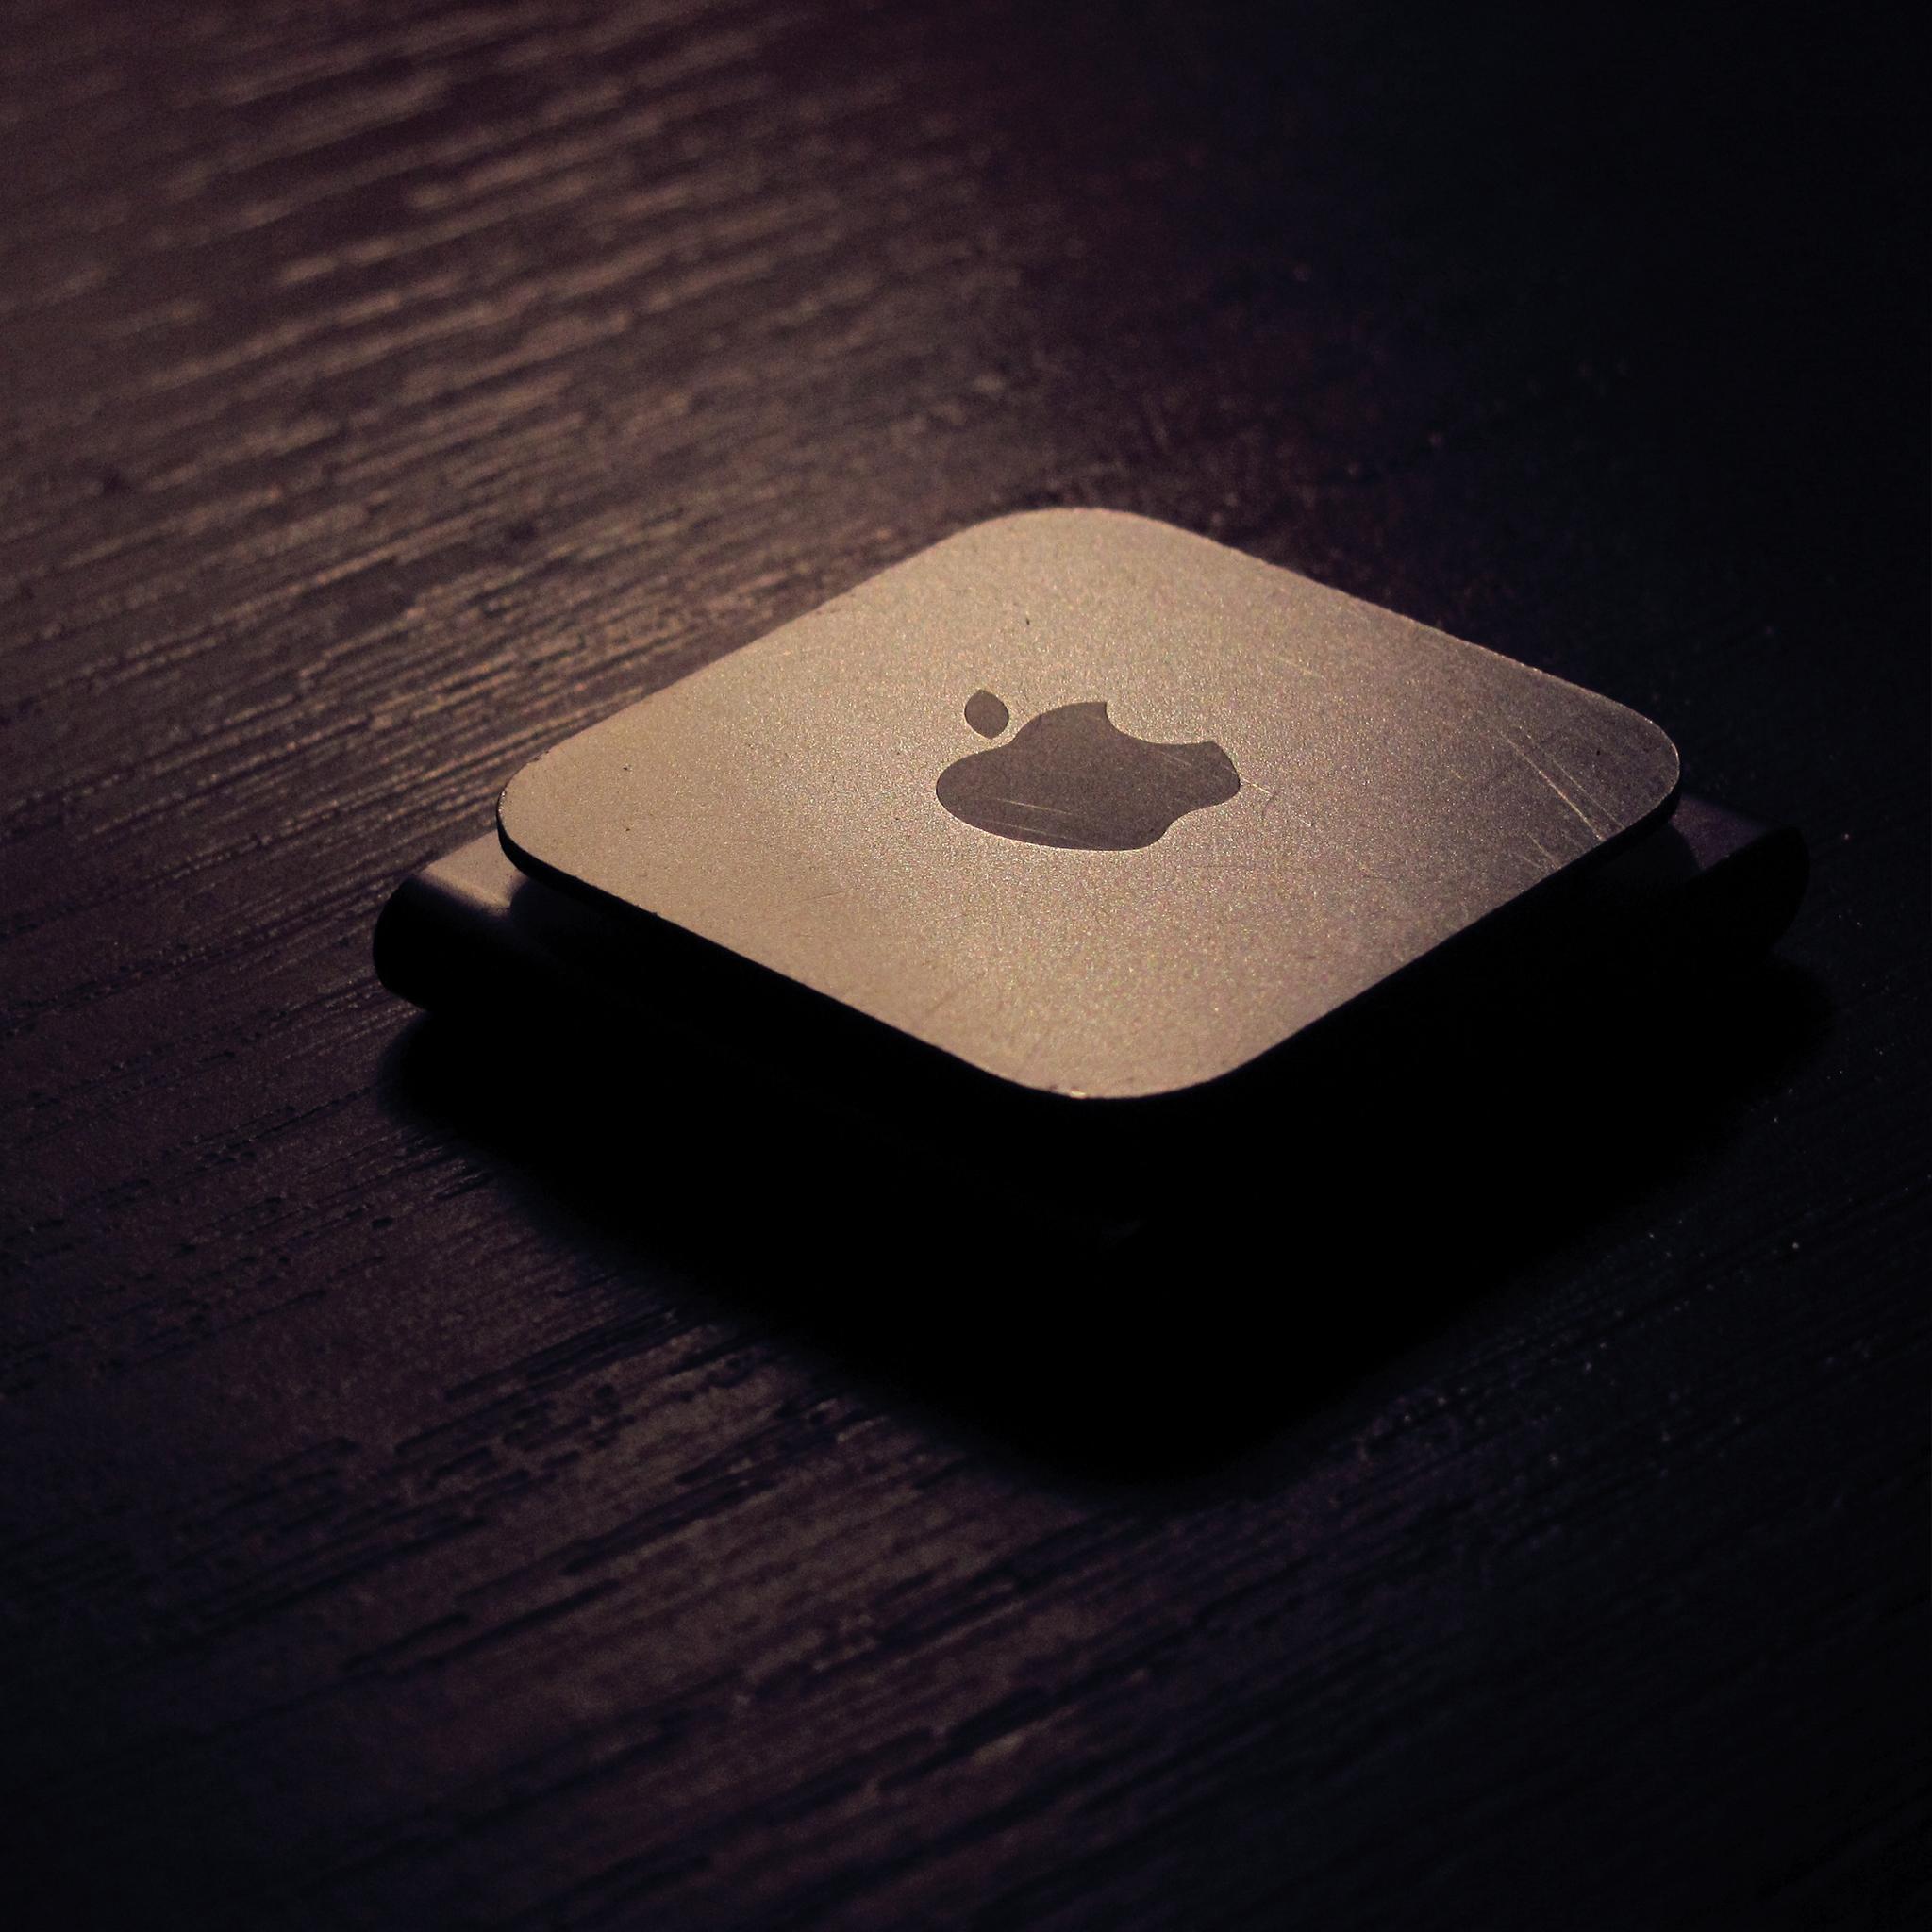 iPod-Nano-3Wallpapers-iPad-Retina